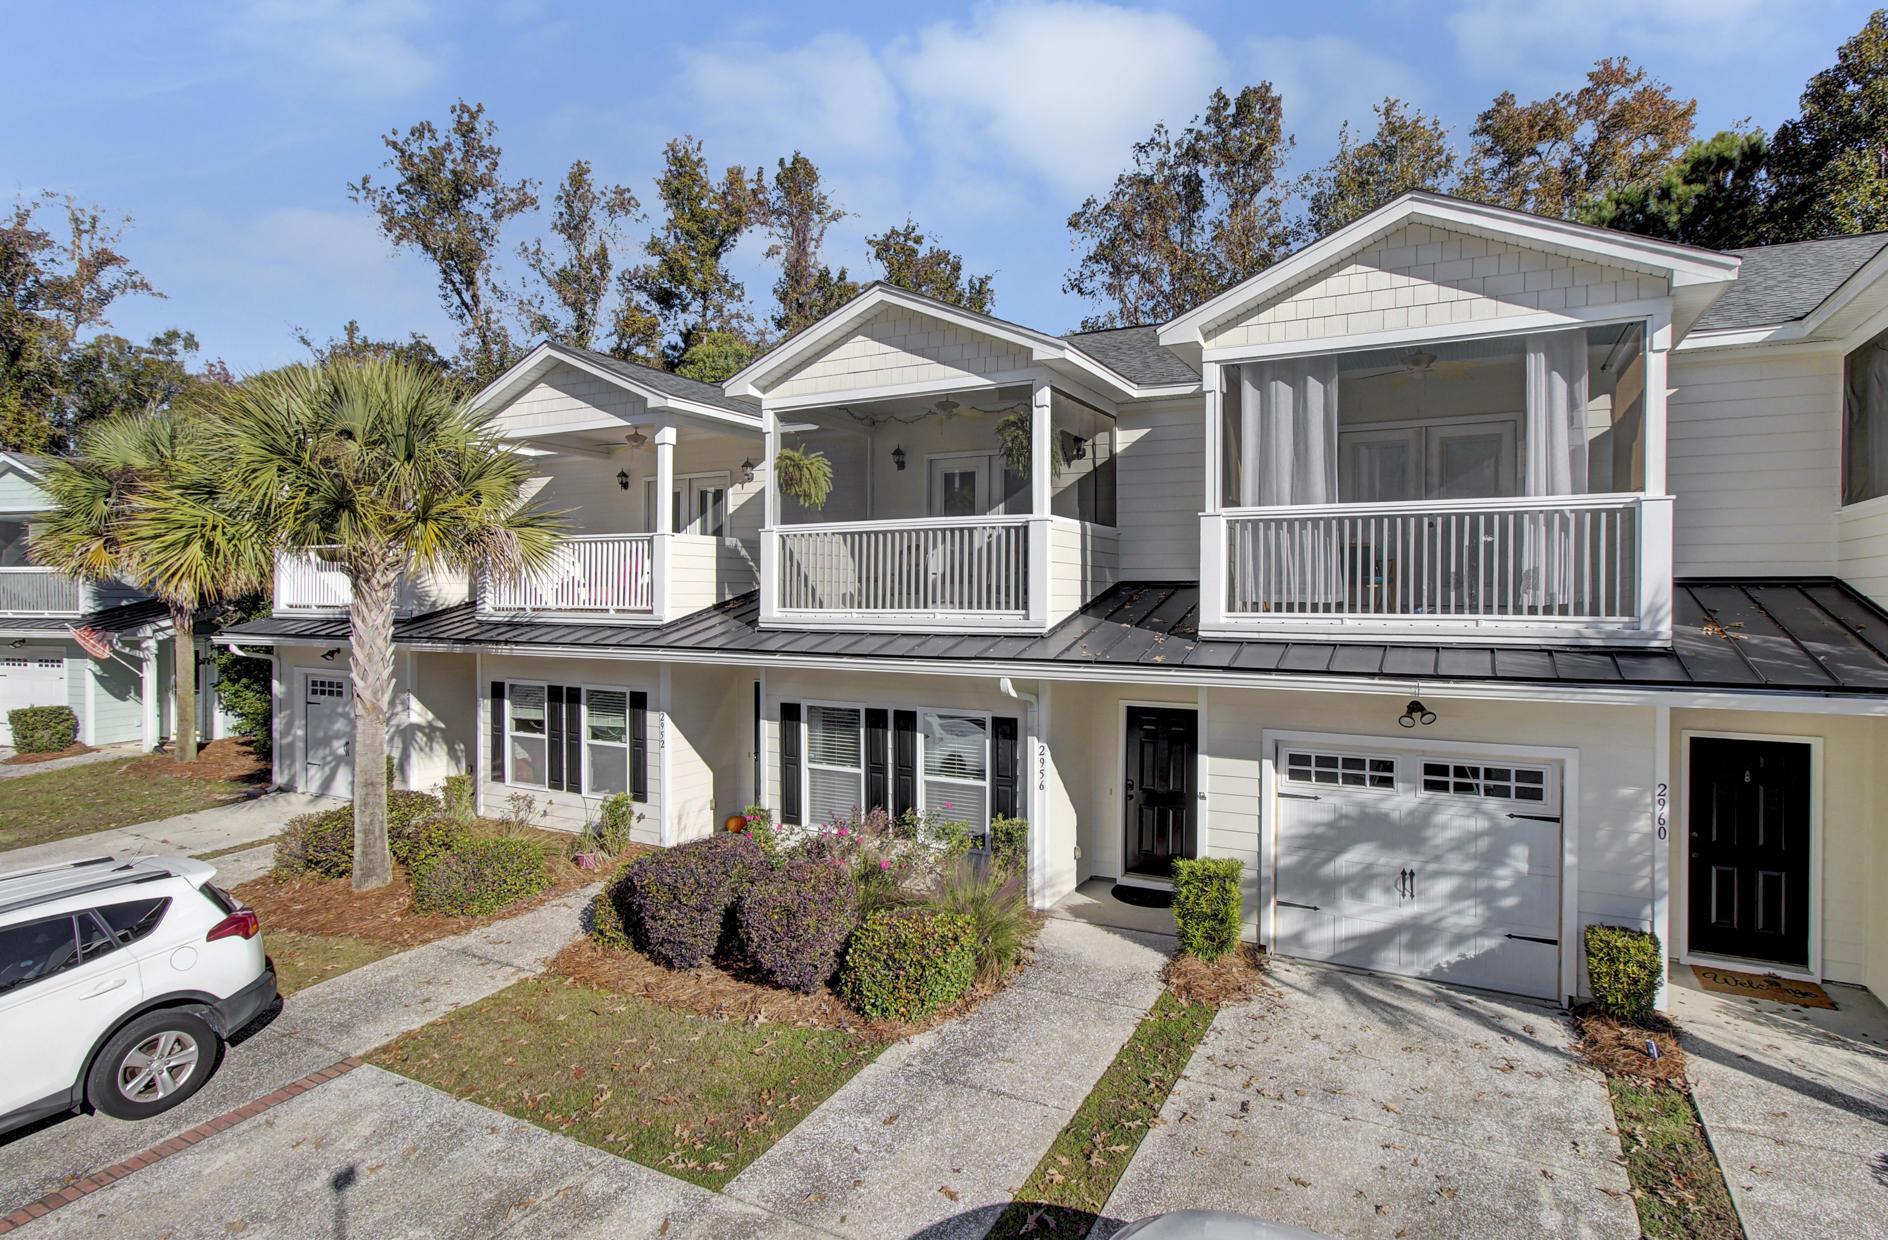 Carol Oaks Town Homes Homes For Sale - 2956 Emma, Mount Pleasant, SC - 13